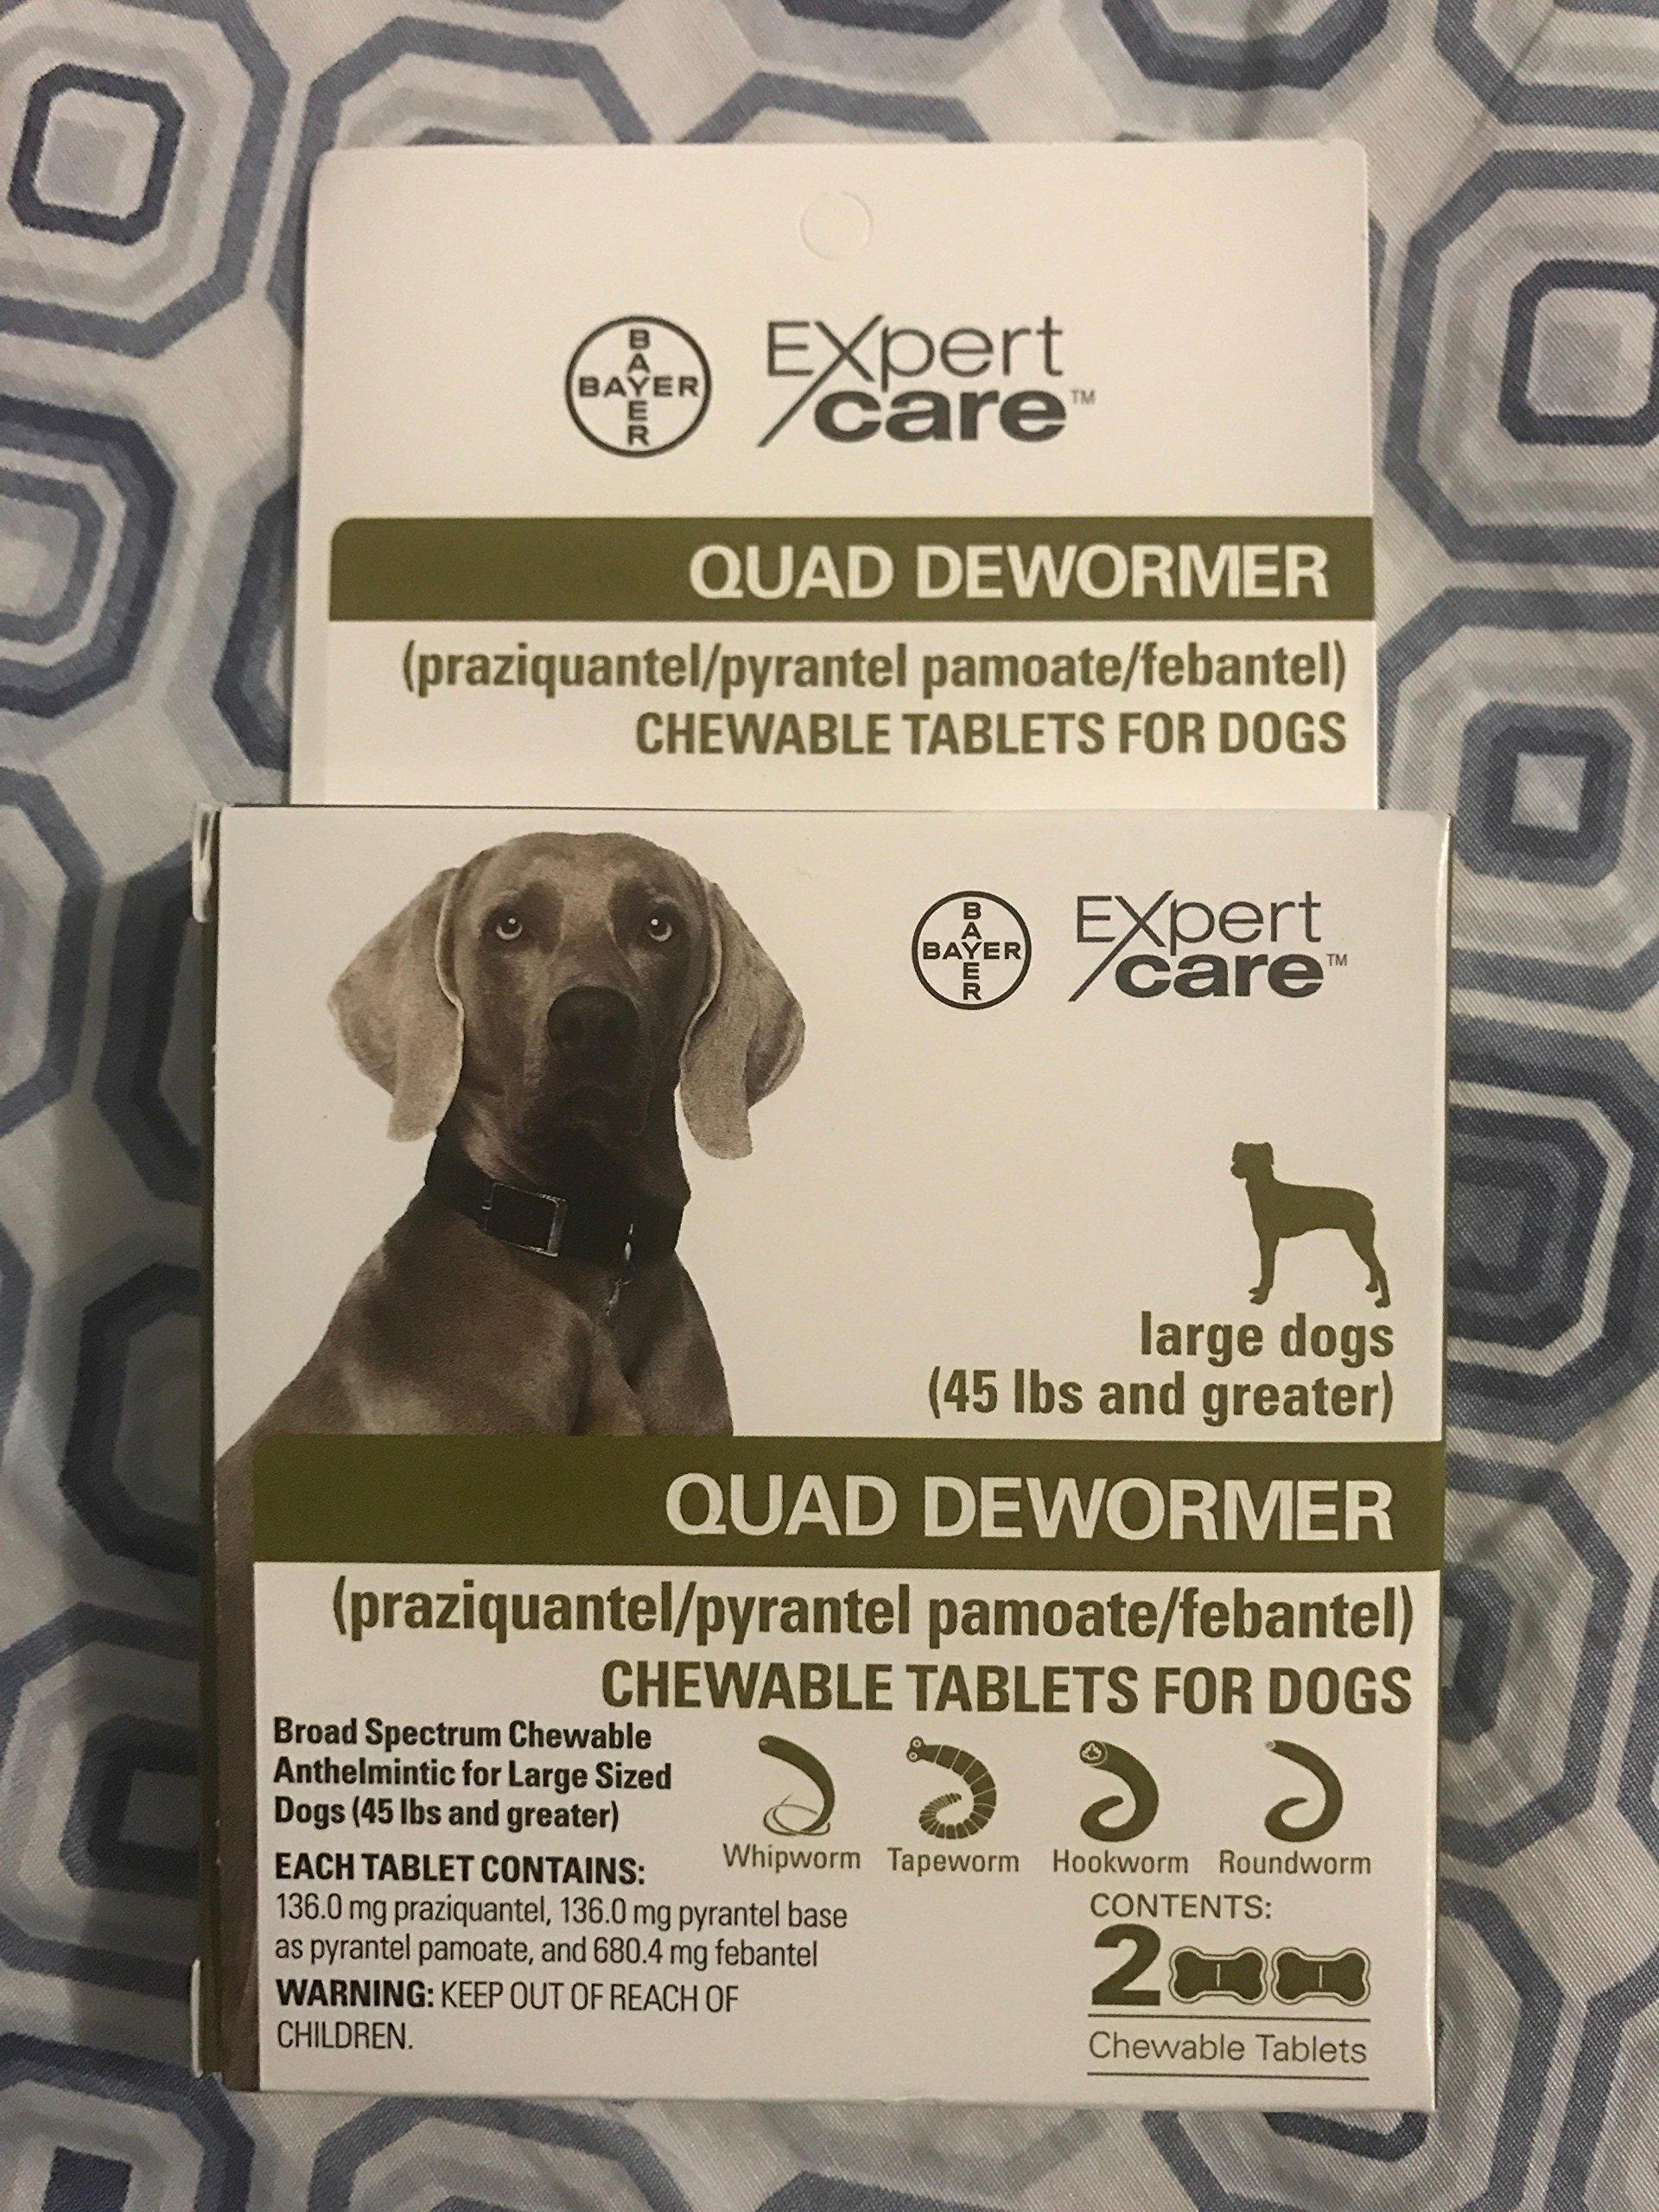 Bayer Animal Health Quad Dewormer Large Dogs (Over 45 lbs) 2 Chewable Tablets by Bayer Animal Health (Image #2)